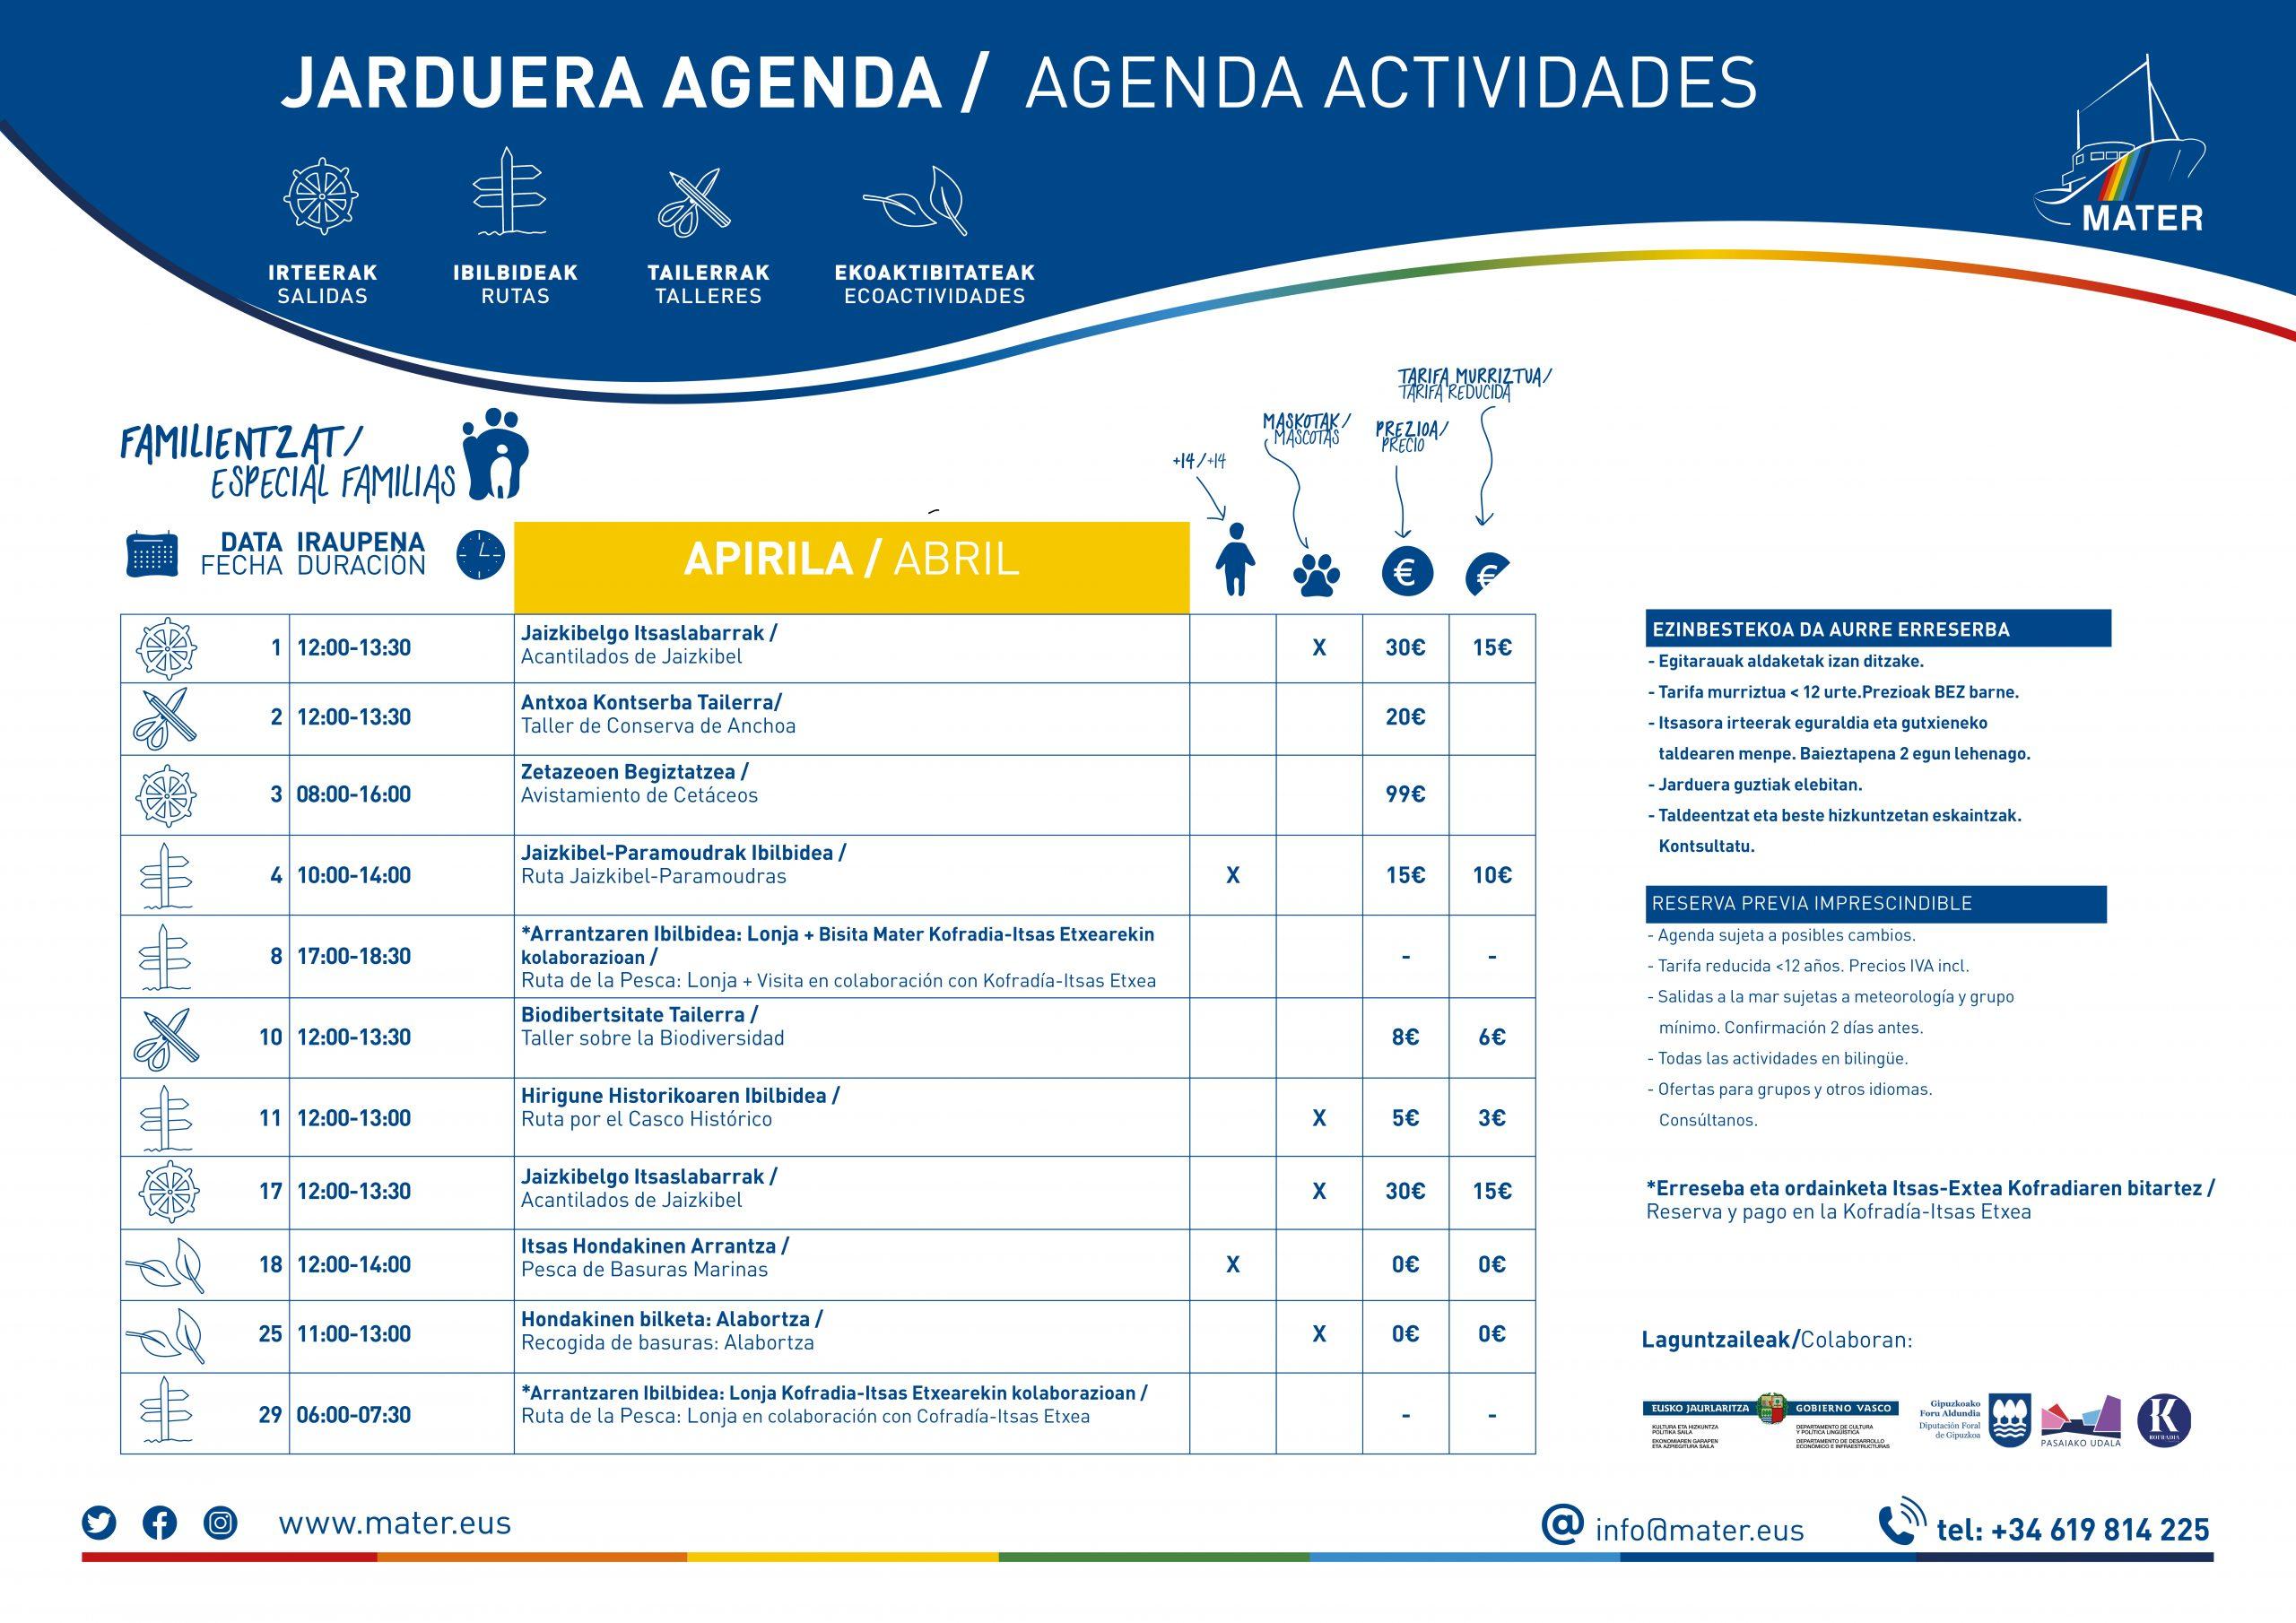 Agenda Apirila/Abril